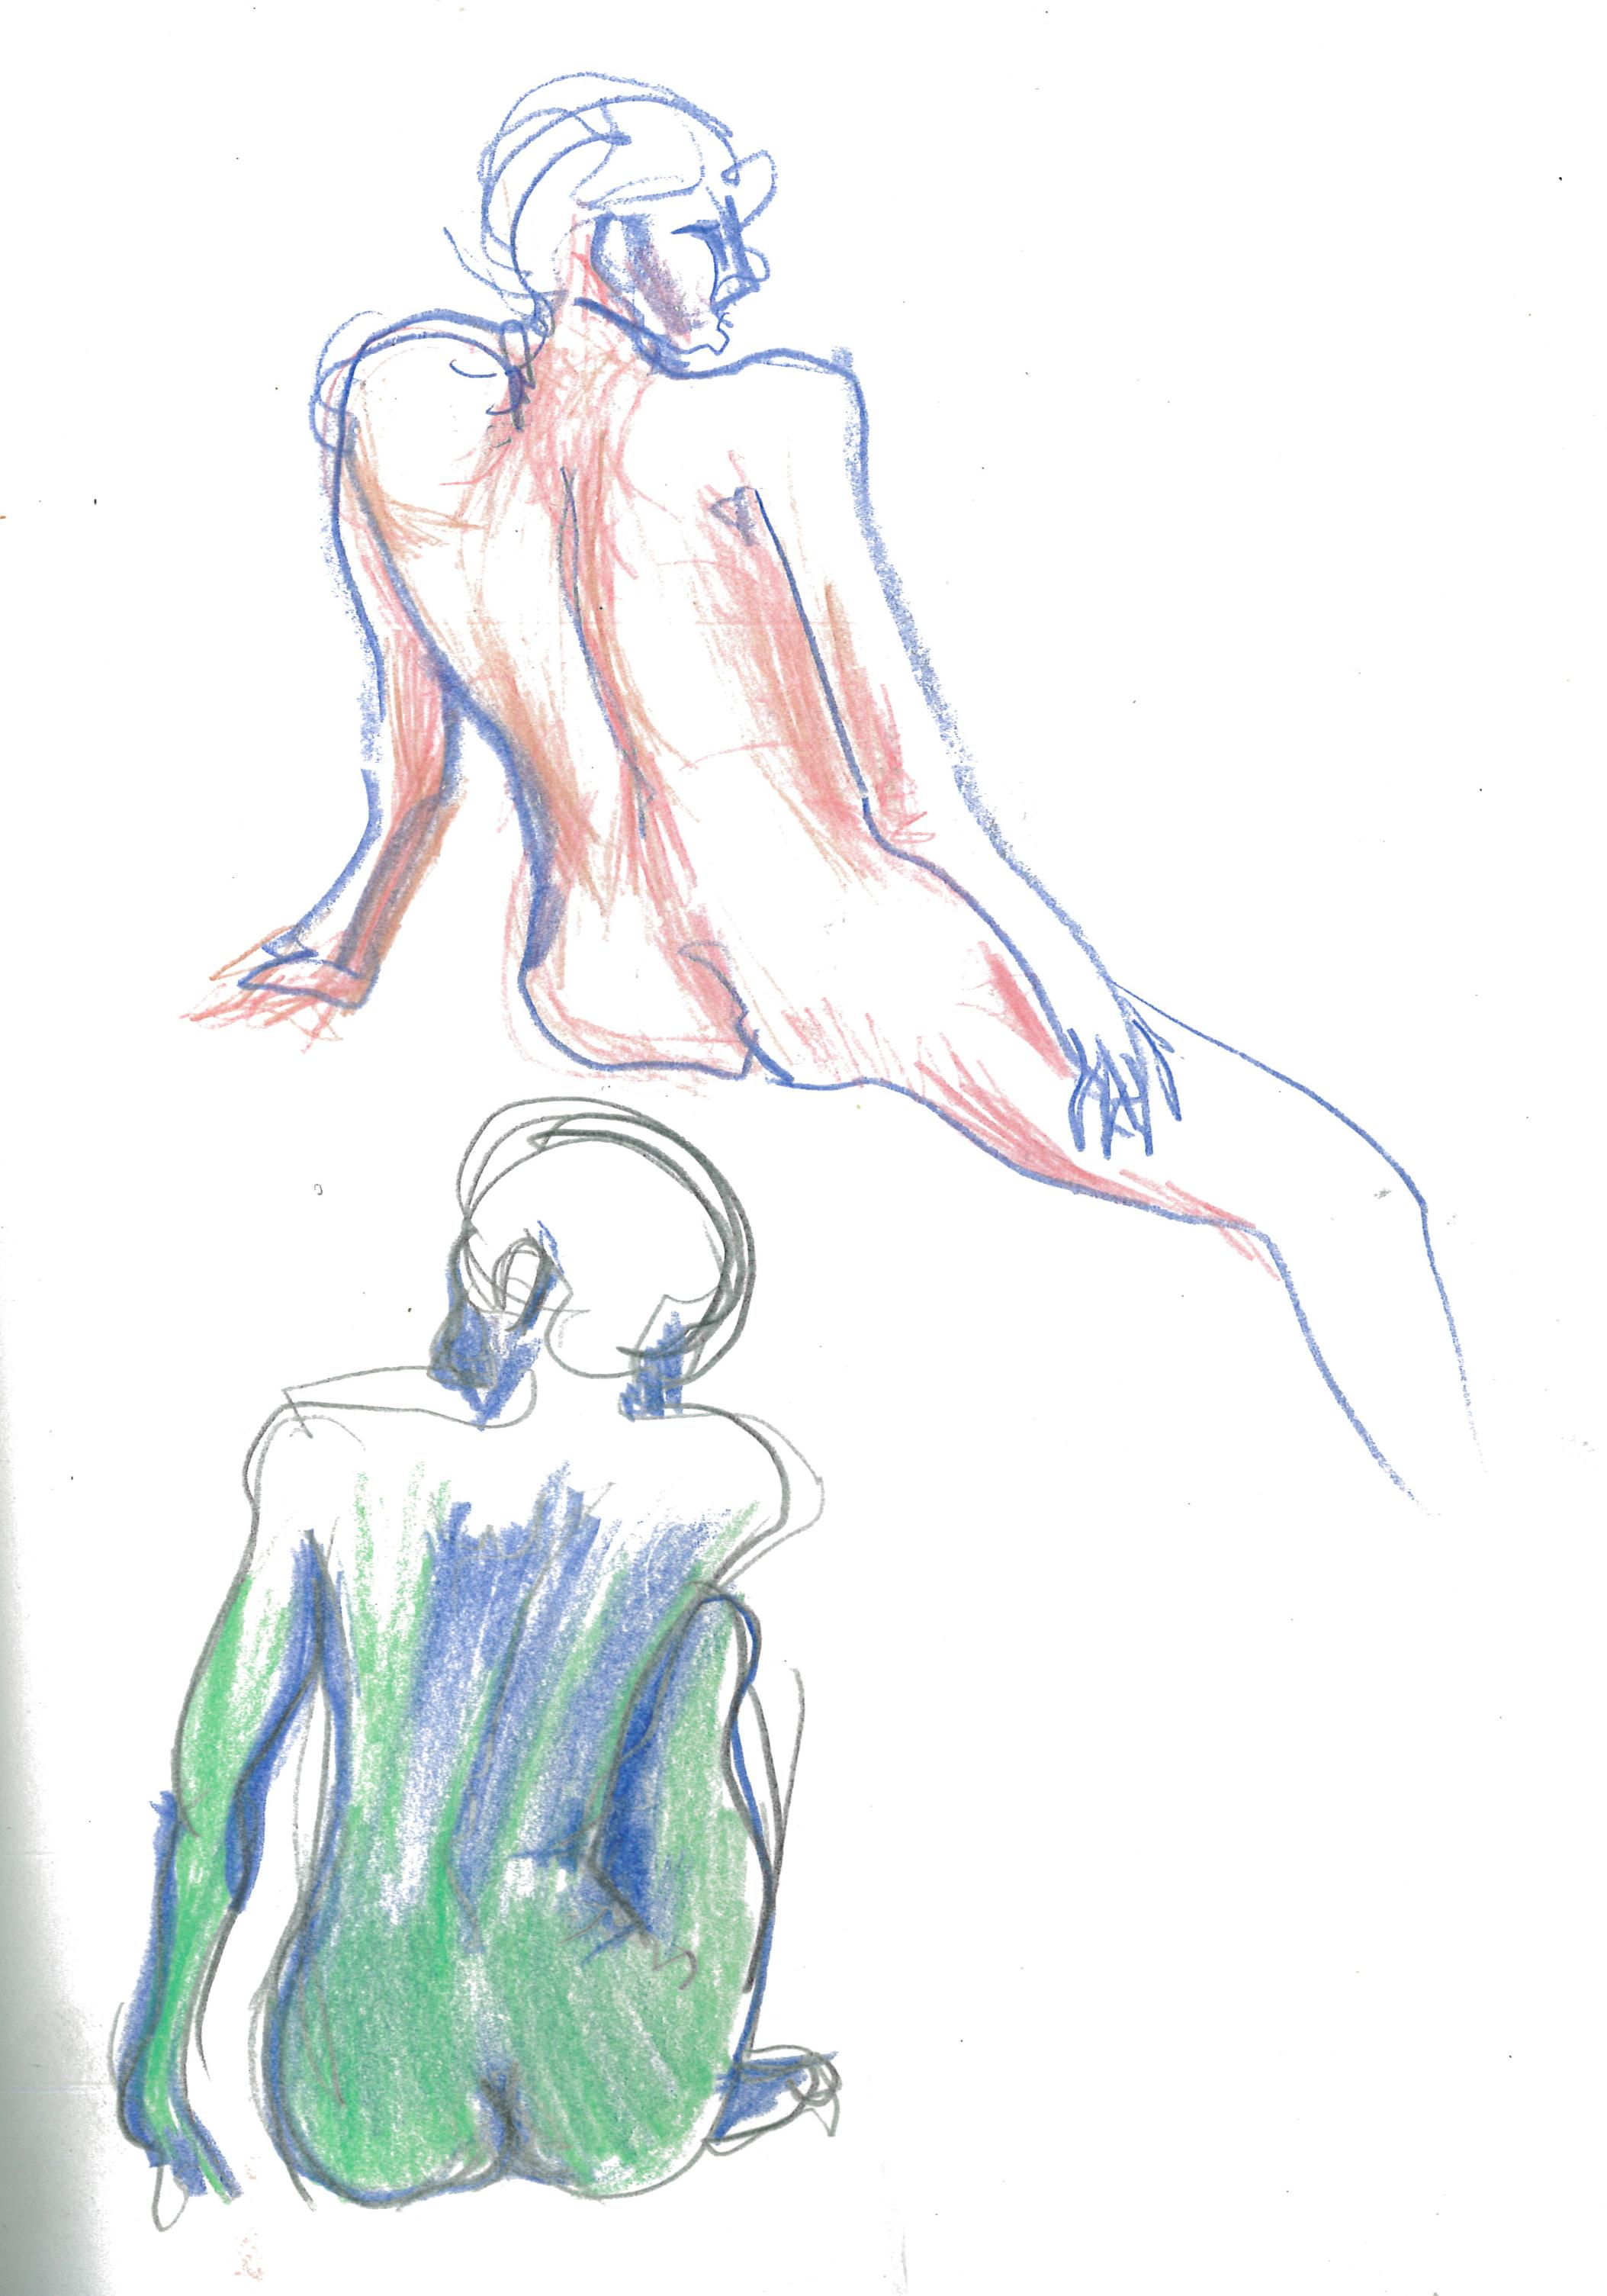 FIGURE_3_SketchbookA_ScanD_Page_6.jpg